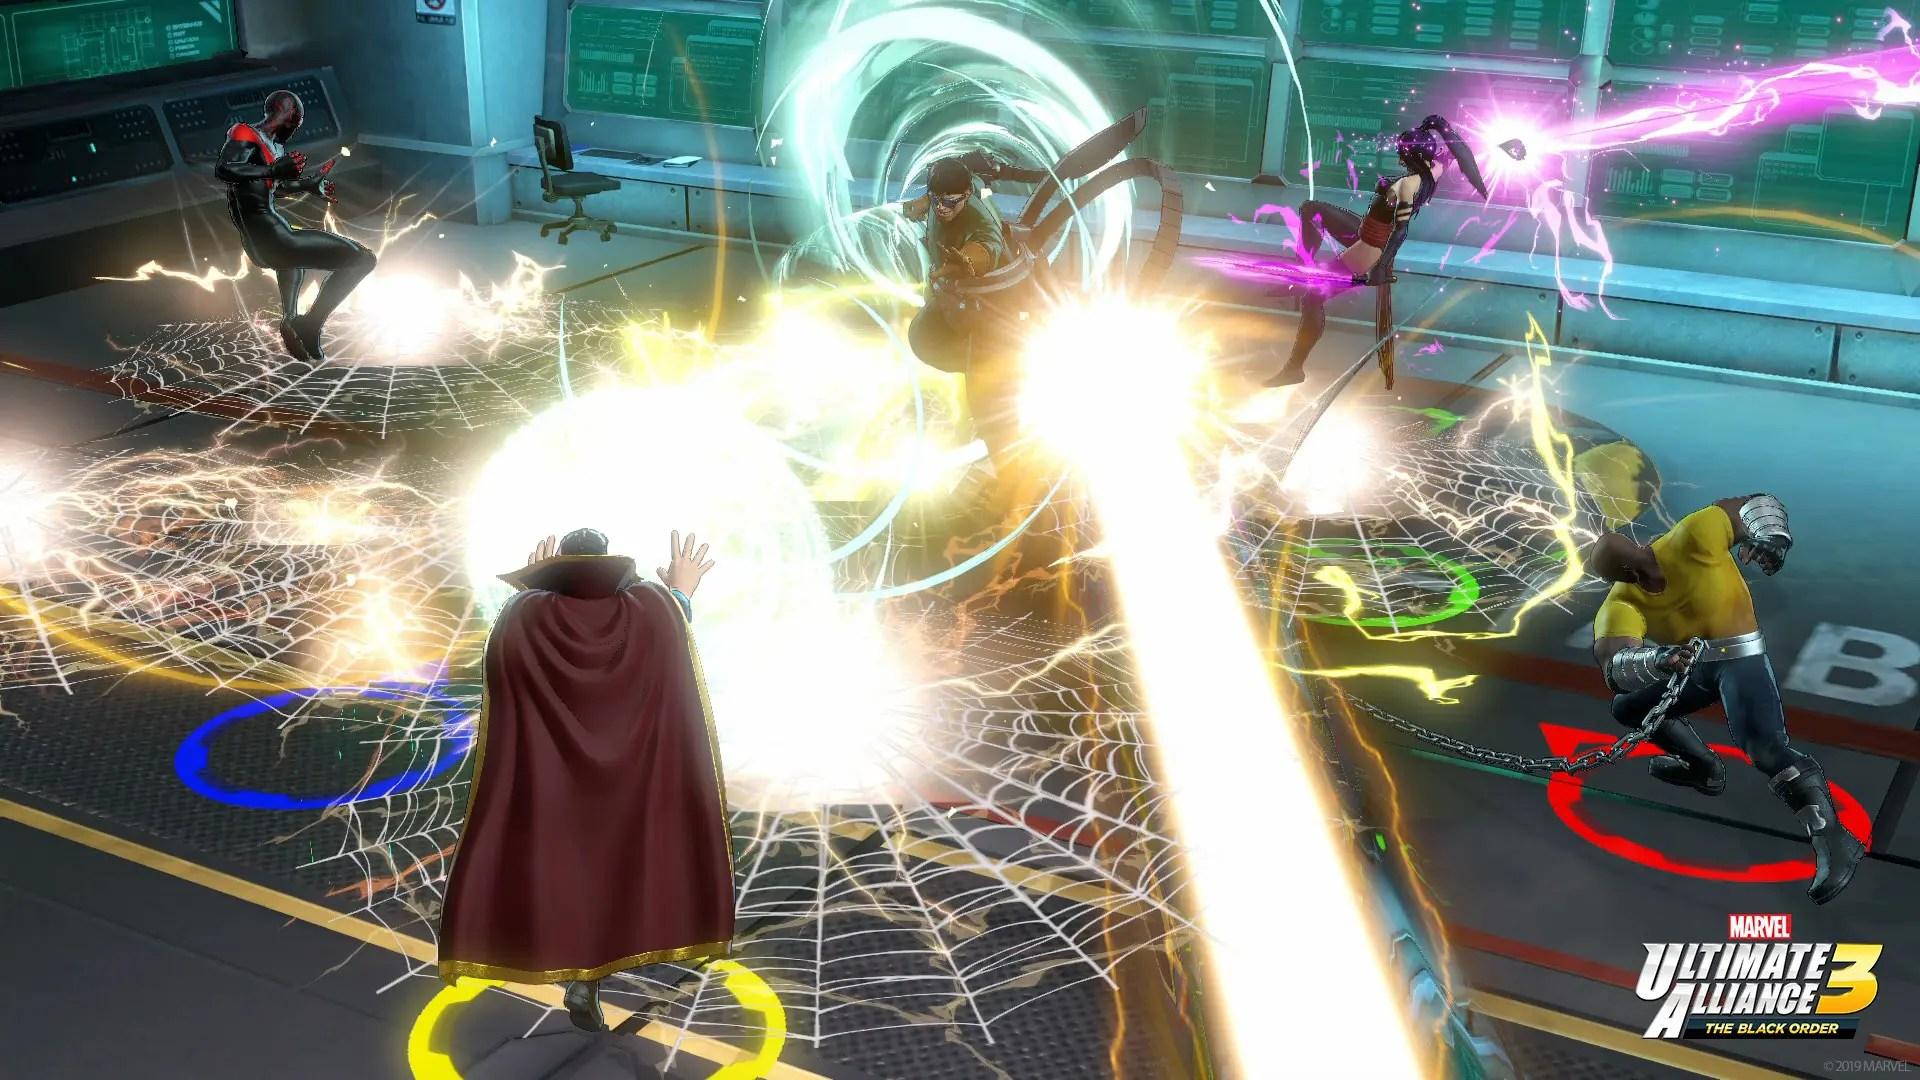 Marvel Ultimate Alliance 3: The Black Order E3 2019 Screenshot 5